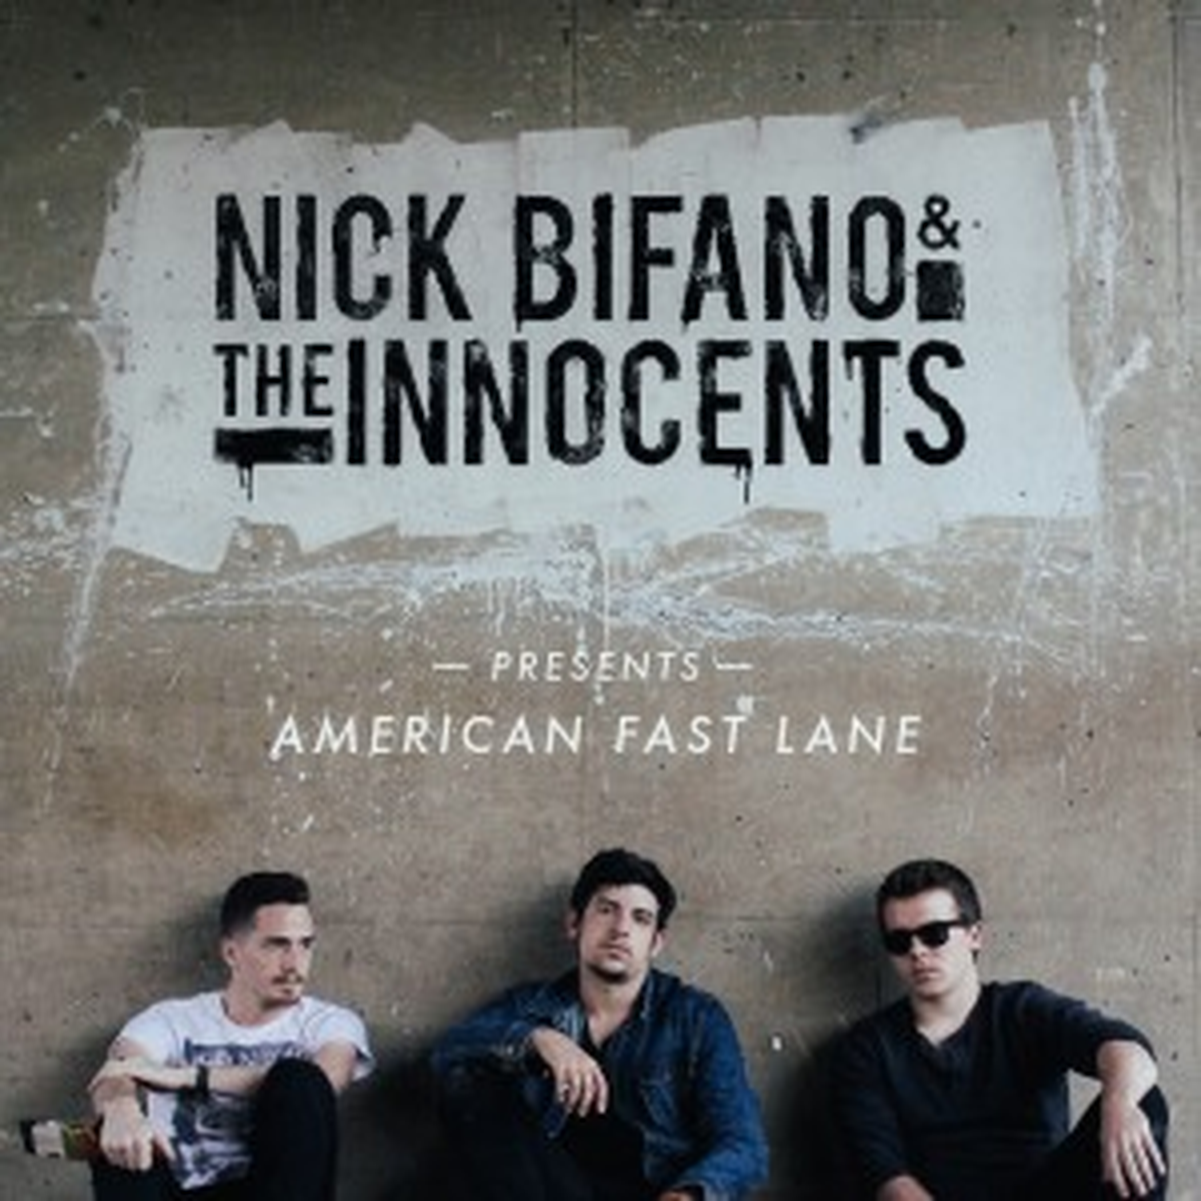 Nick Bifano & The Innocents